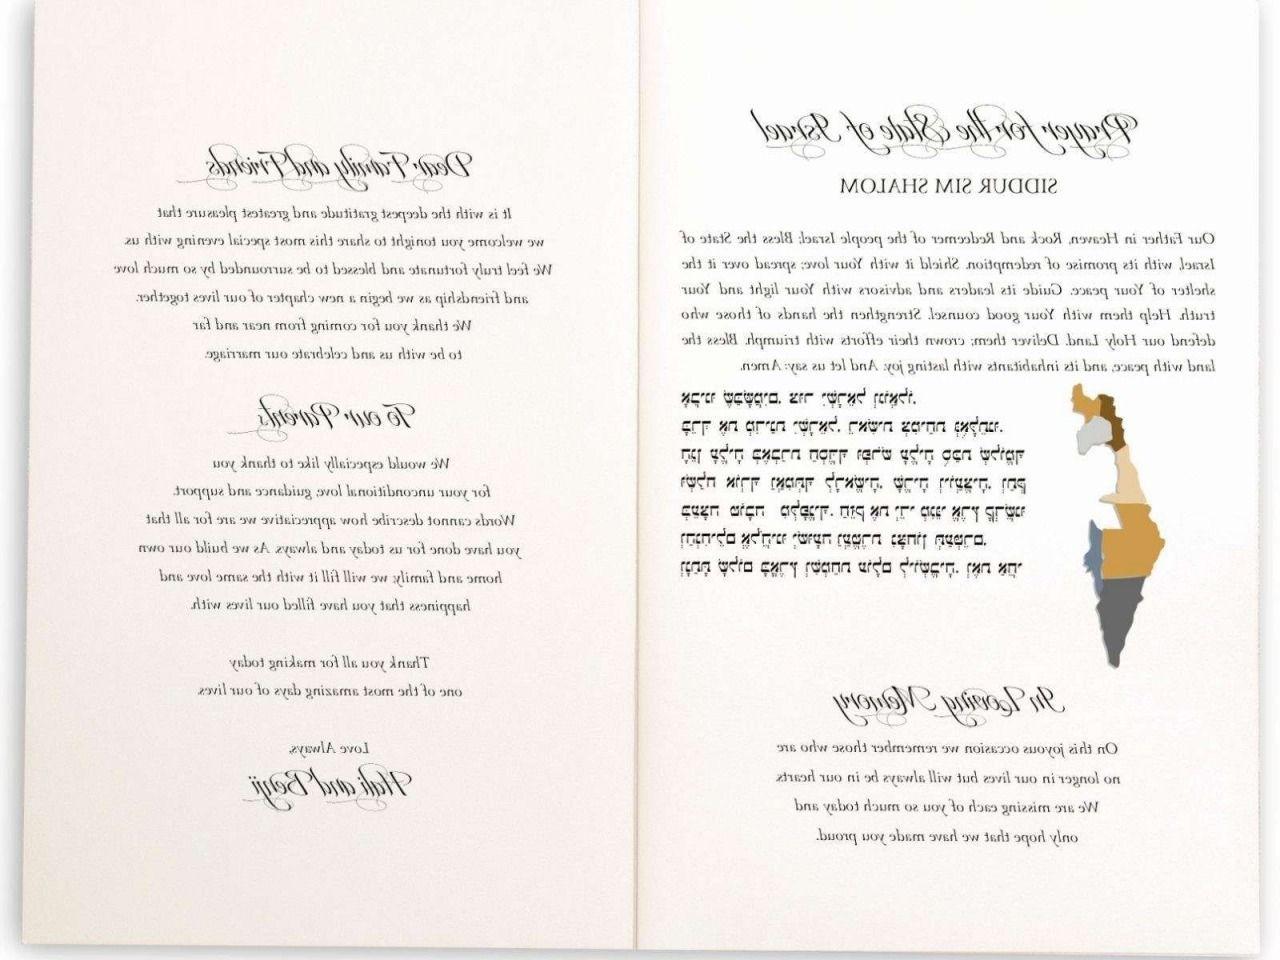 70 Luxury Wedding Invitation Samples Free Templates 2018 Check More At 50th Wedding Anniversary Invitations Free Wedding Invitations Fun Wedding Invitations